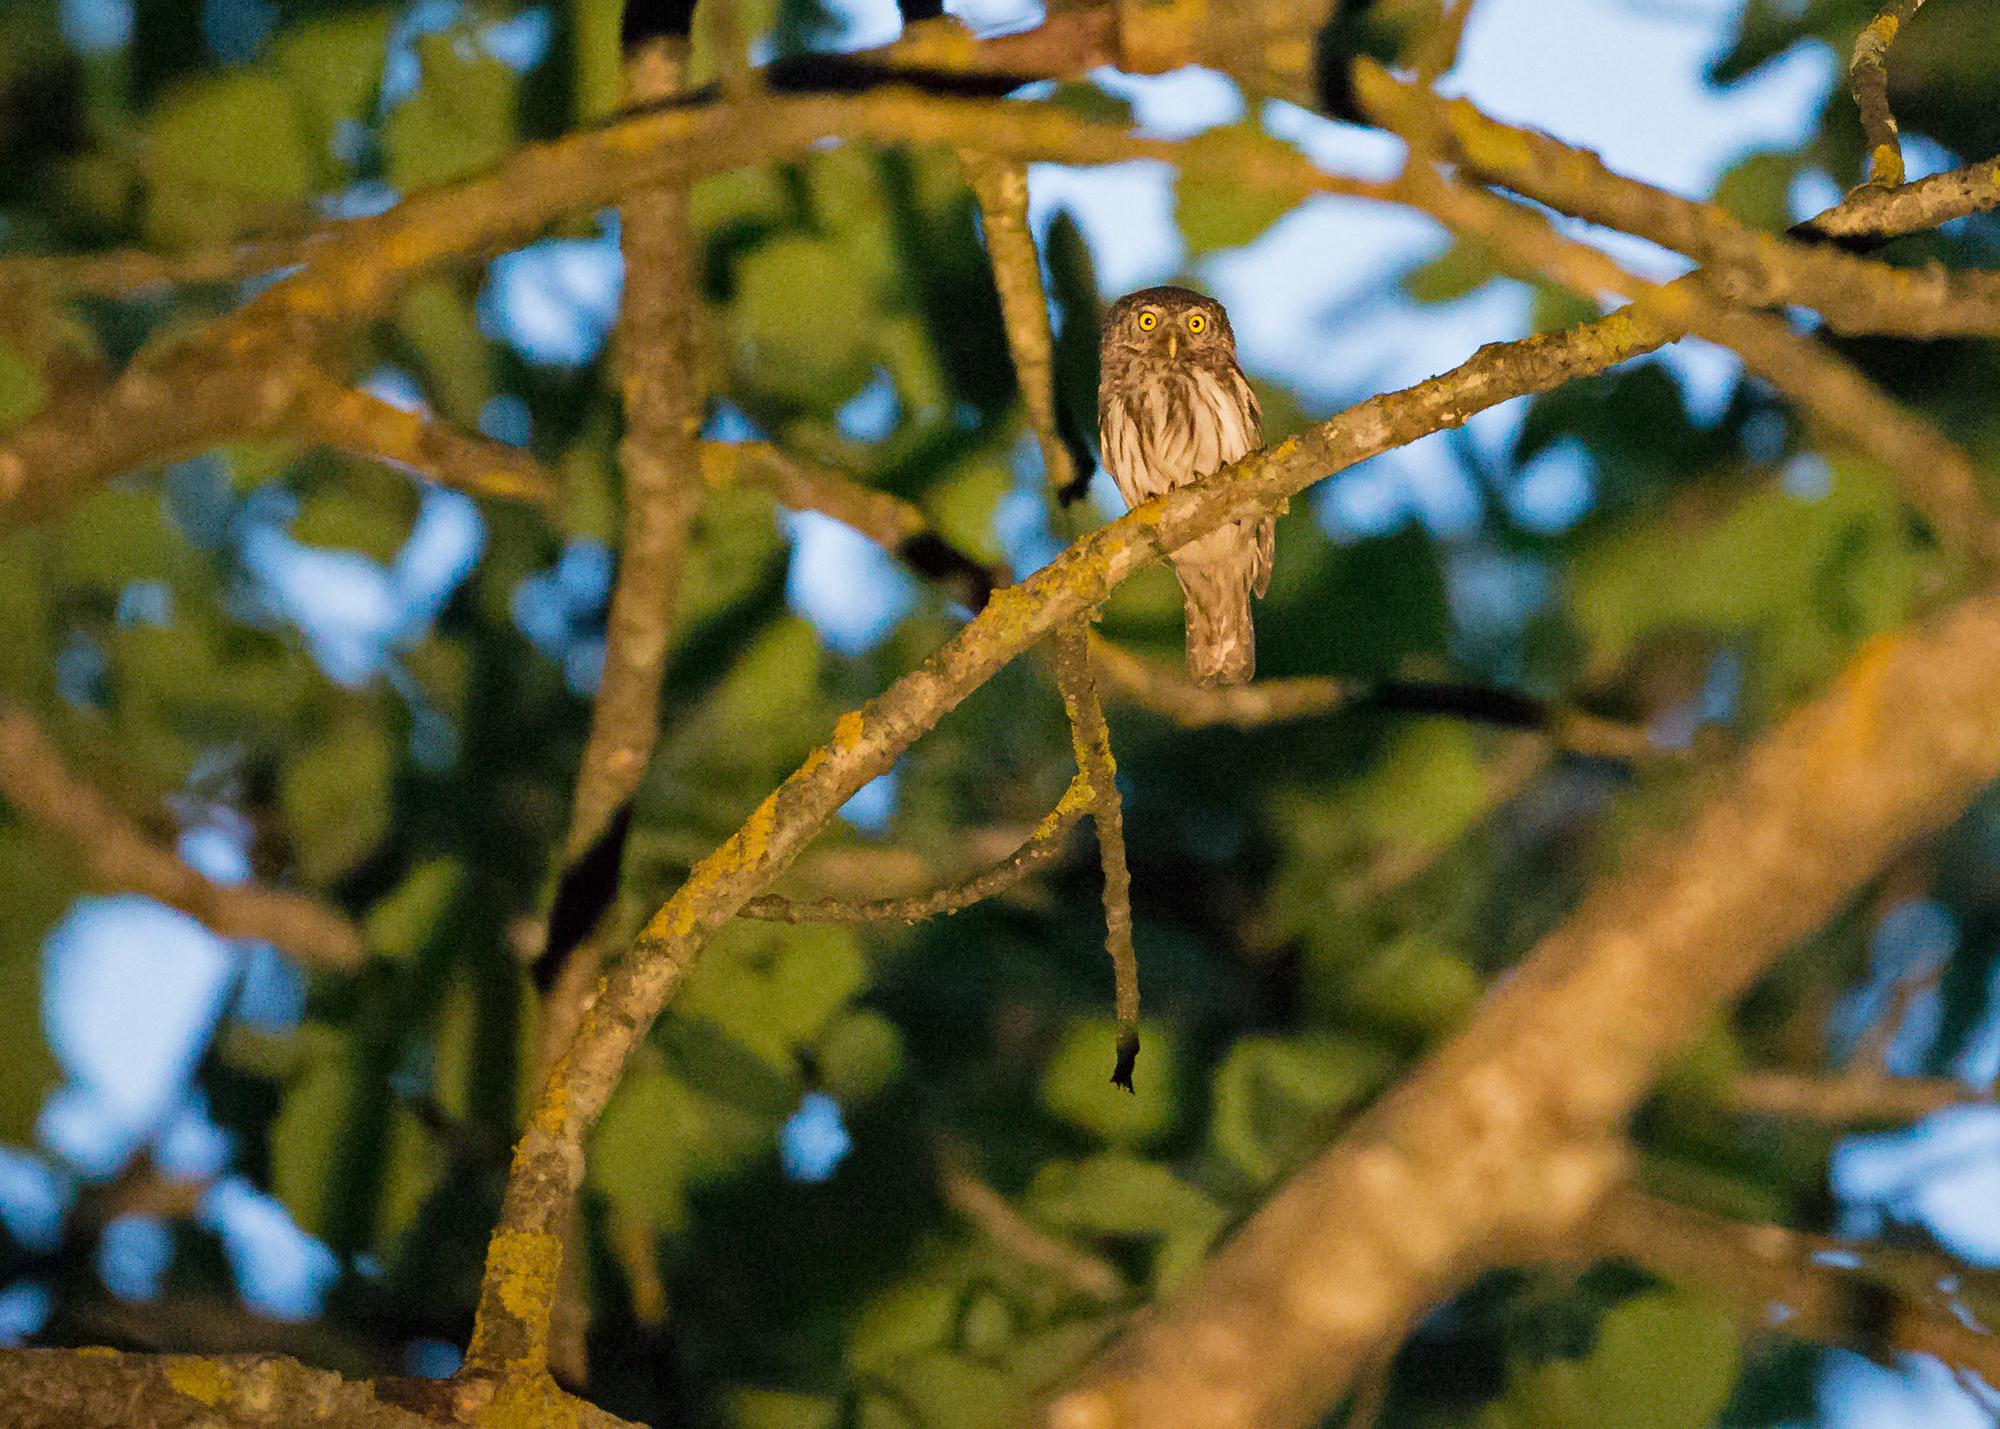 Eurasian Pygmy Owl, Pripyatsky National Park in torchlight at 32000 ISO!